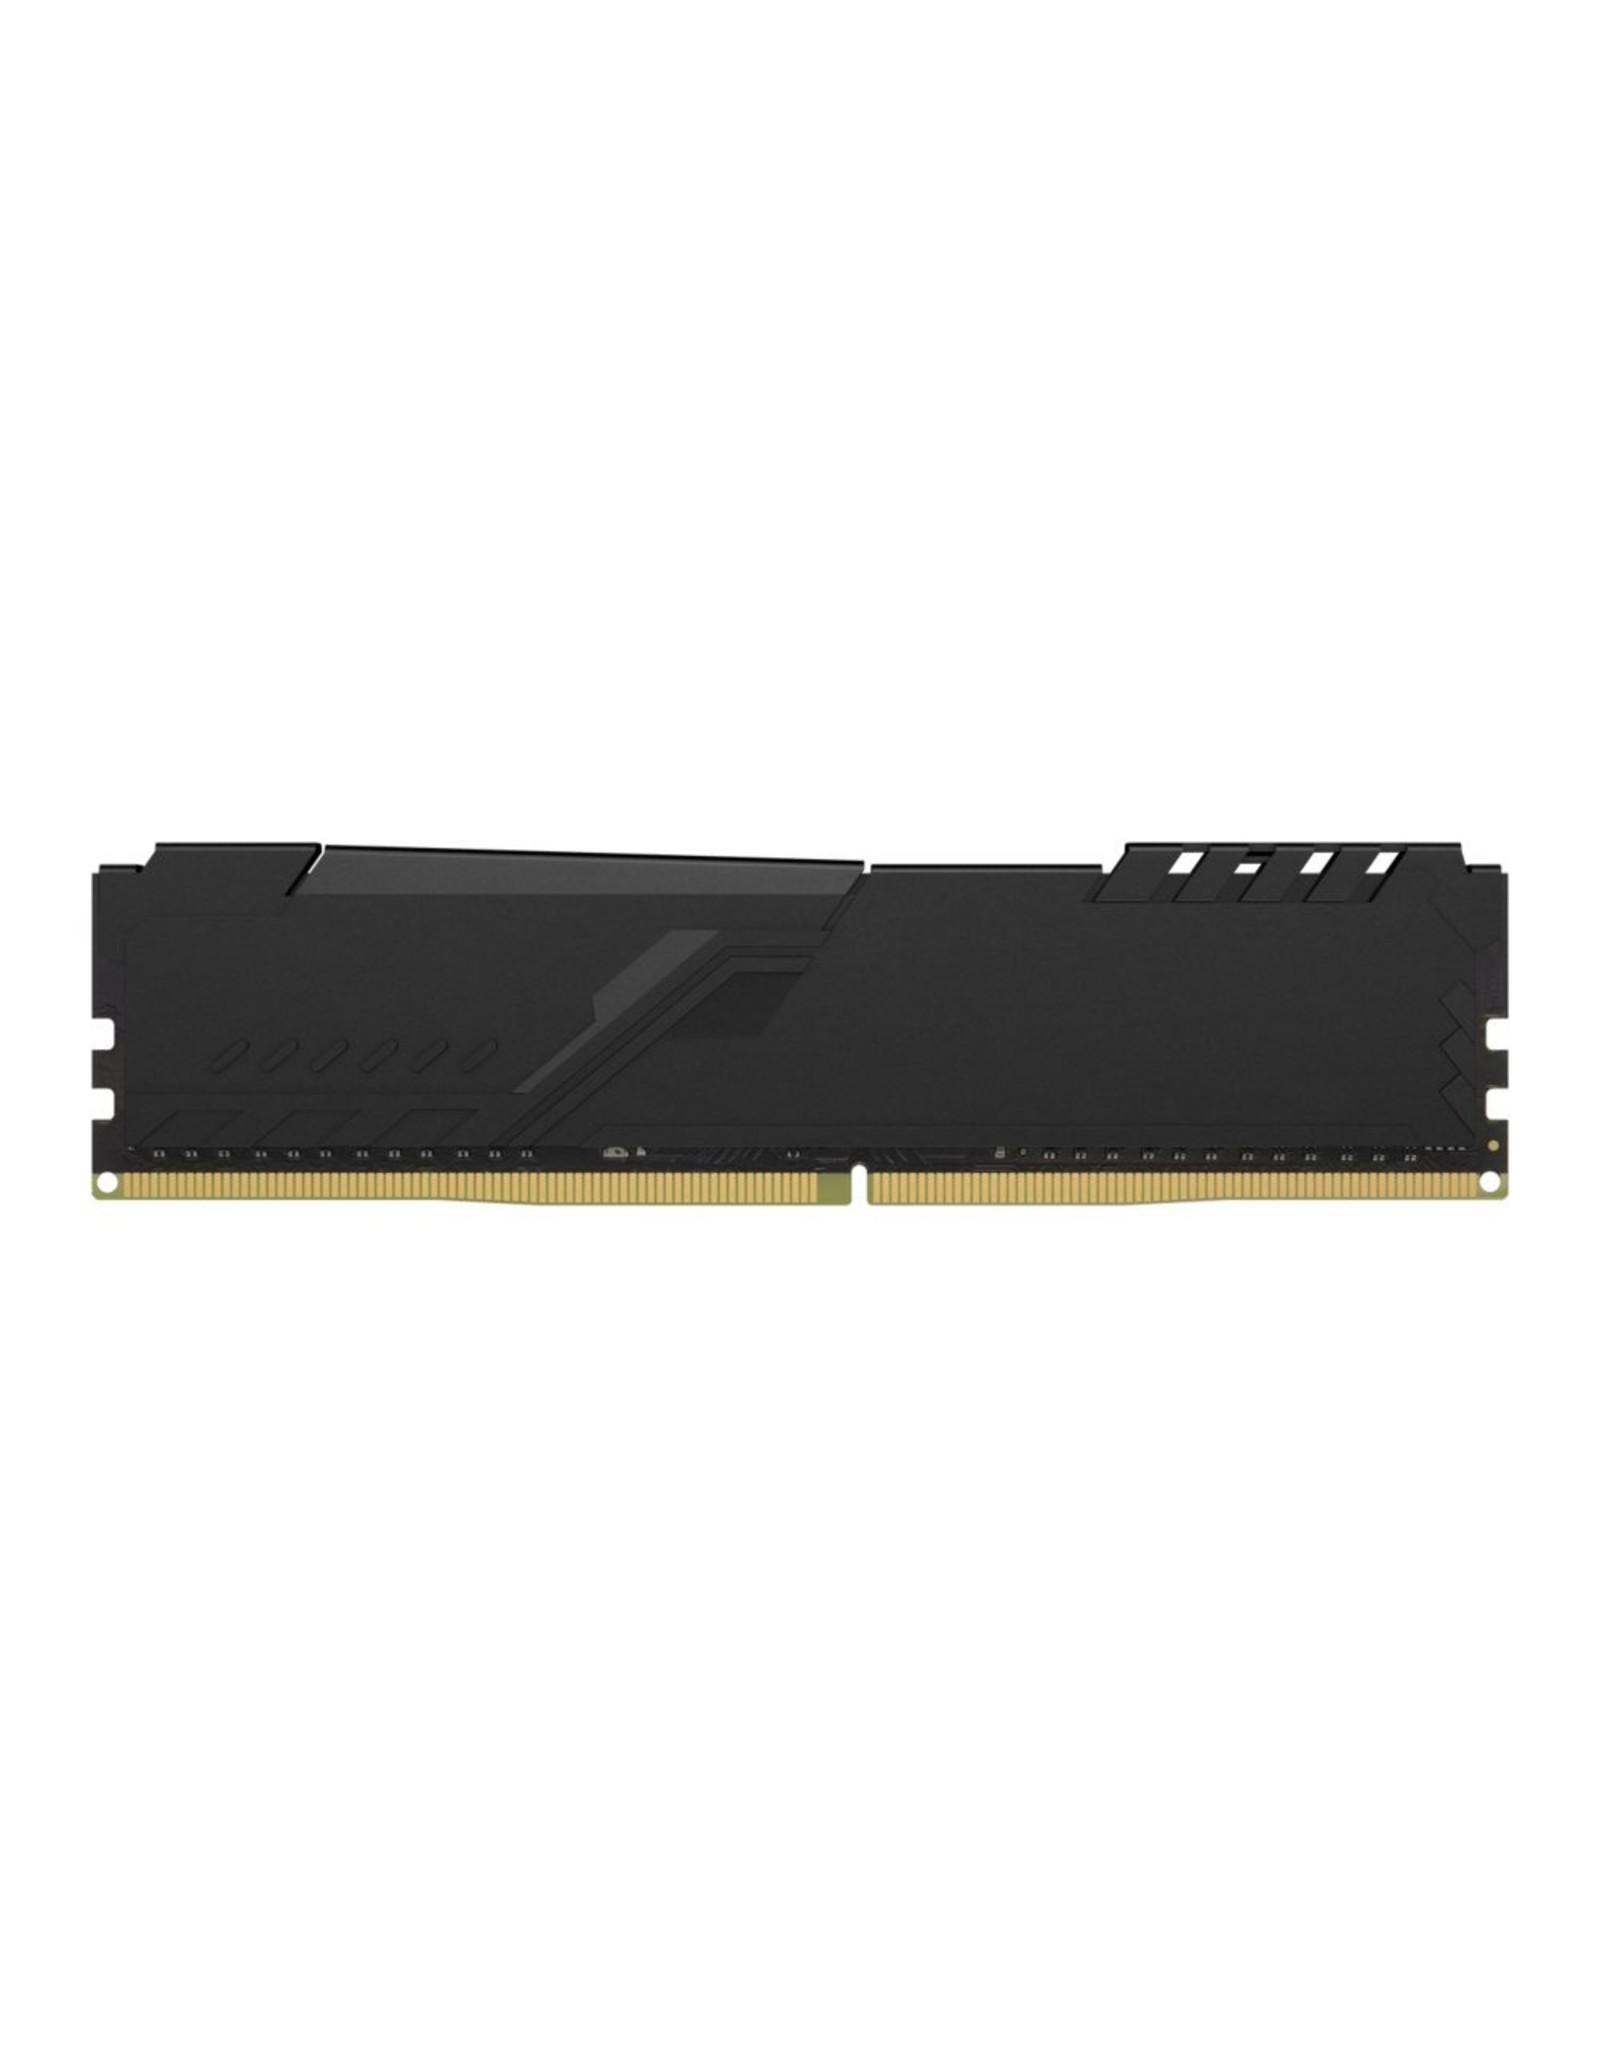 Kingston MEM  HyperX Fury 16GB DDR4 2400MHz Dimm